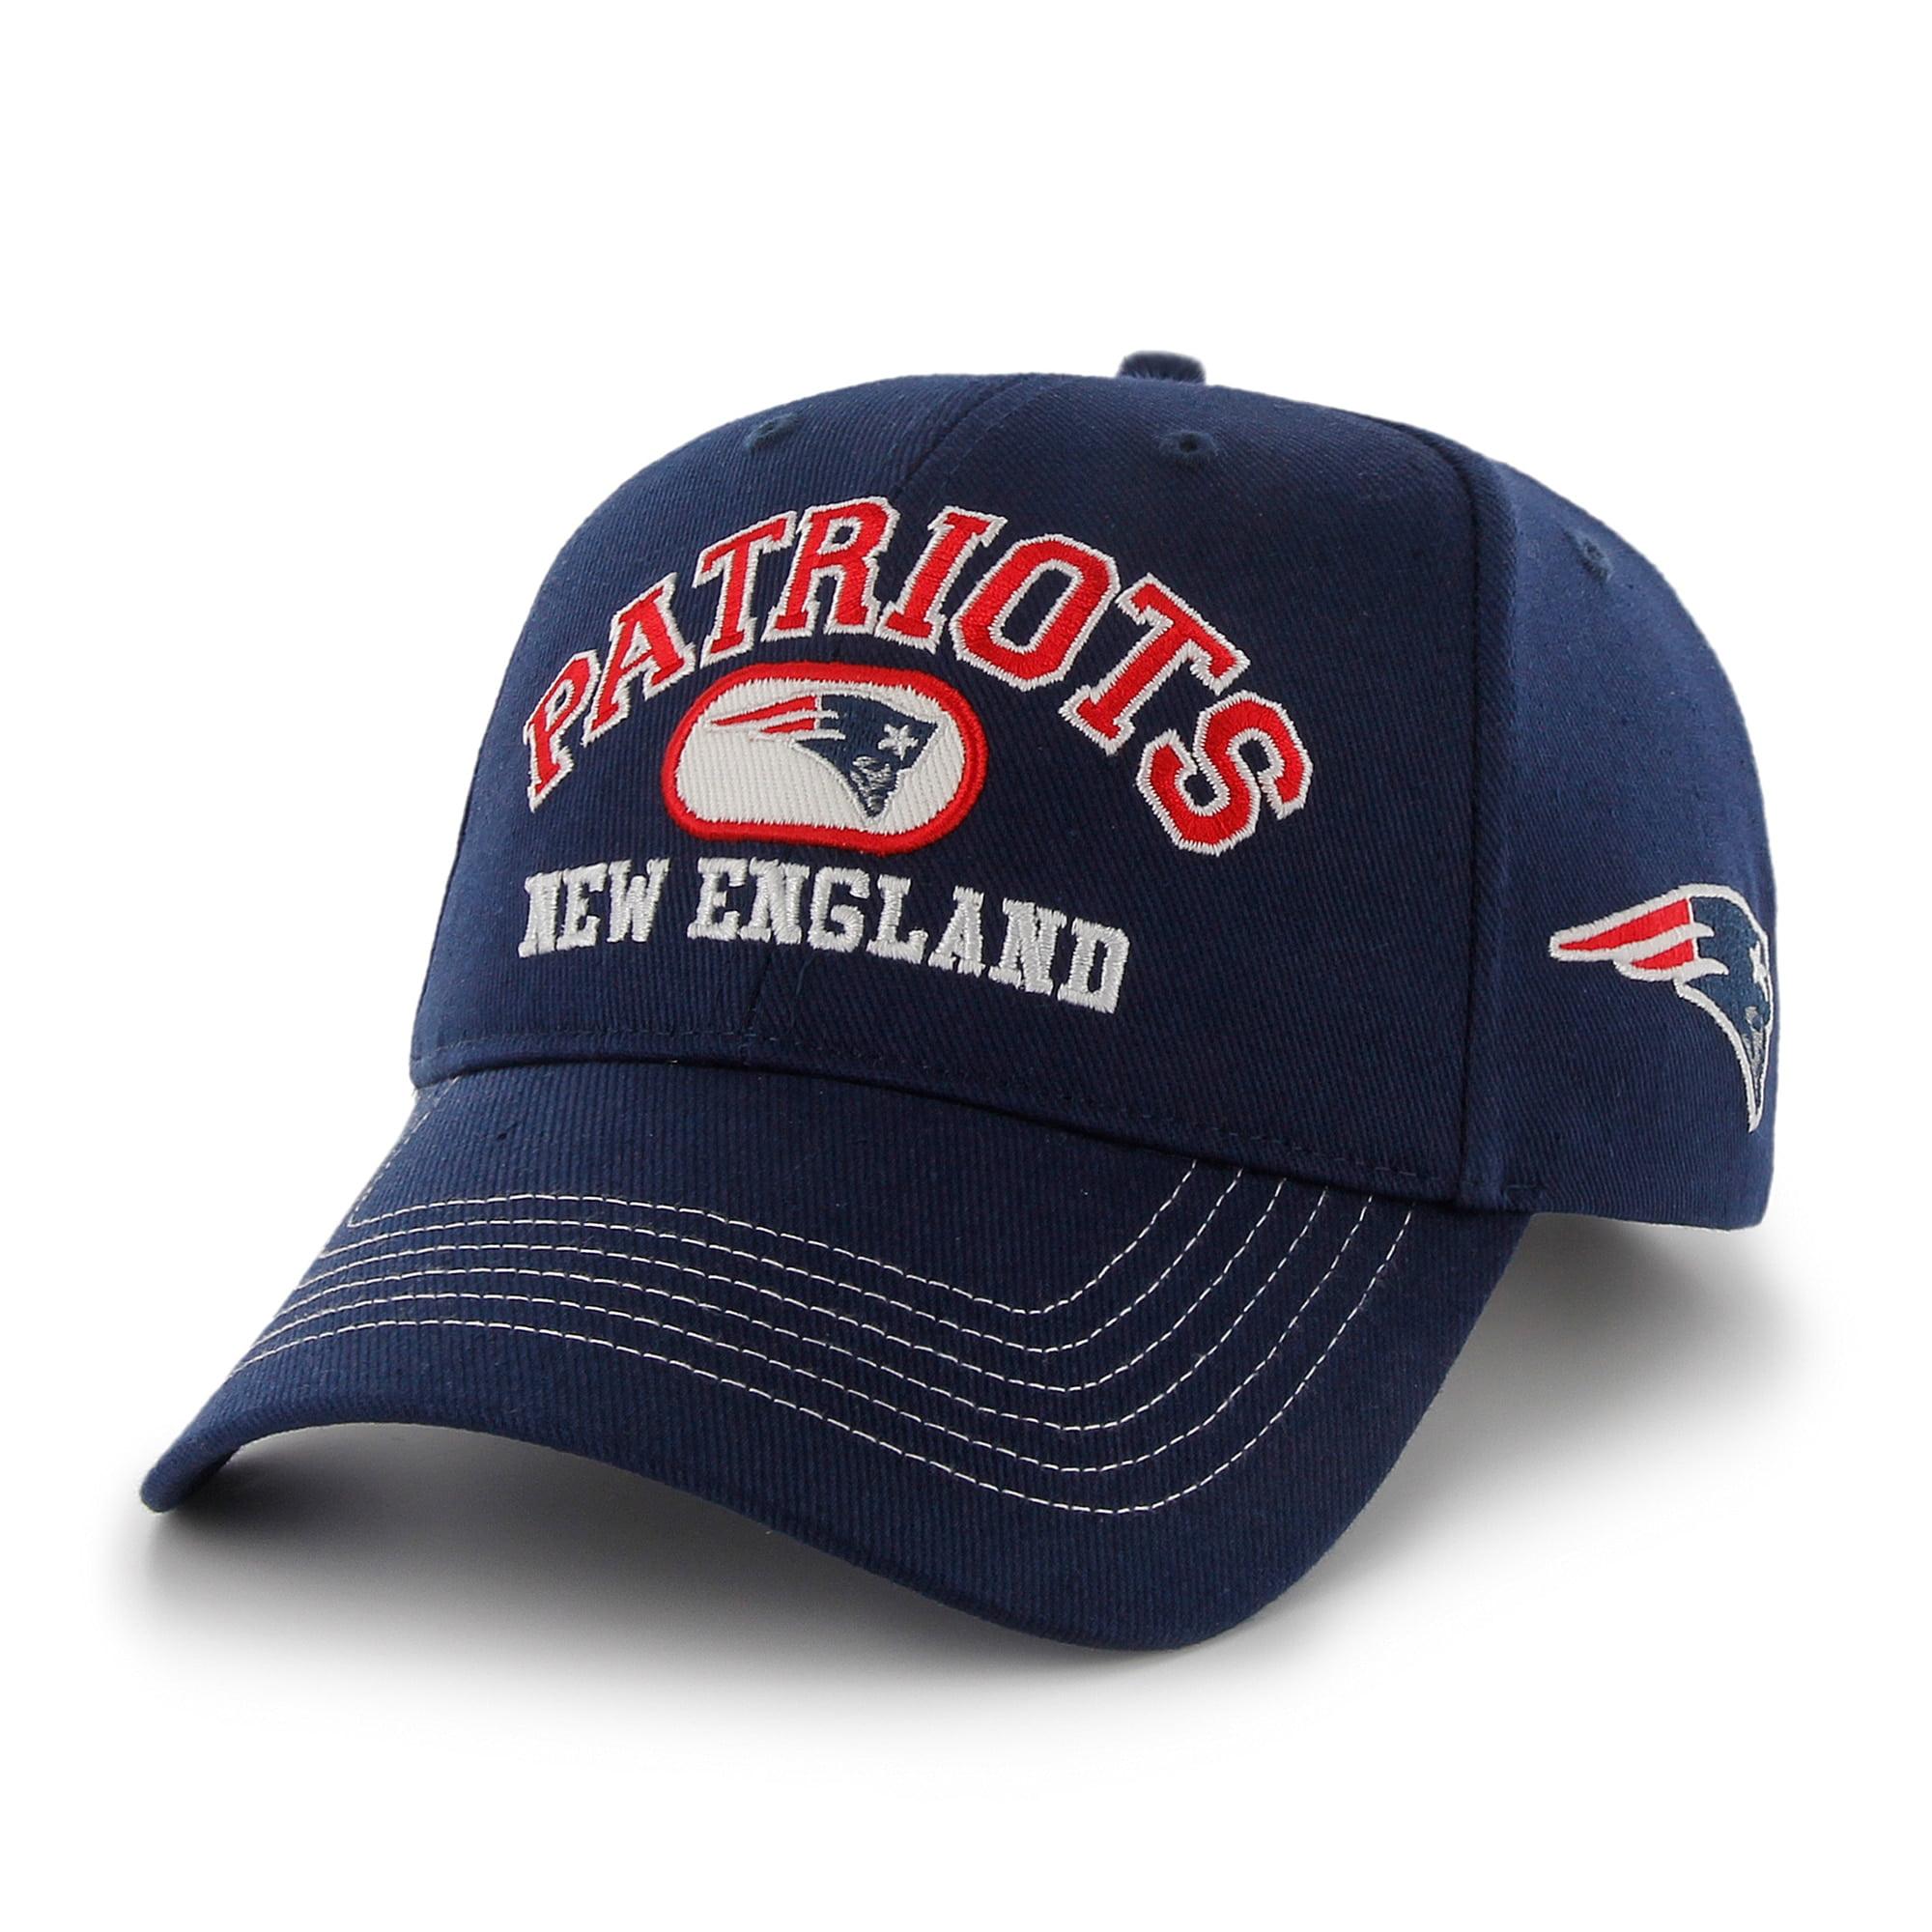 NFL New England Patriots Mass Draft Cap - Fan Favorite